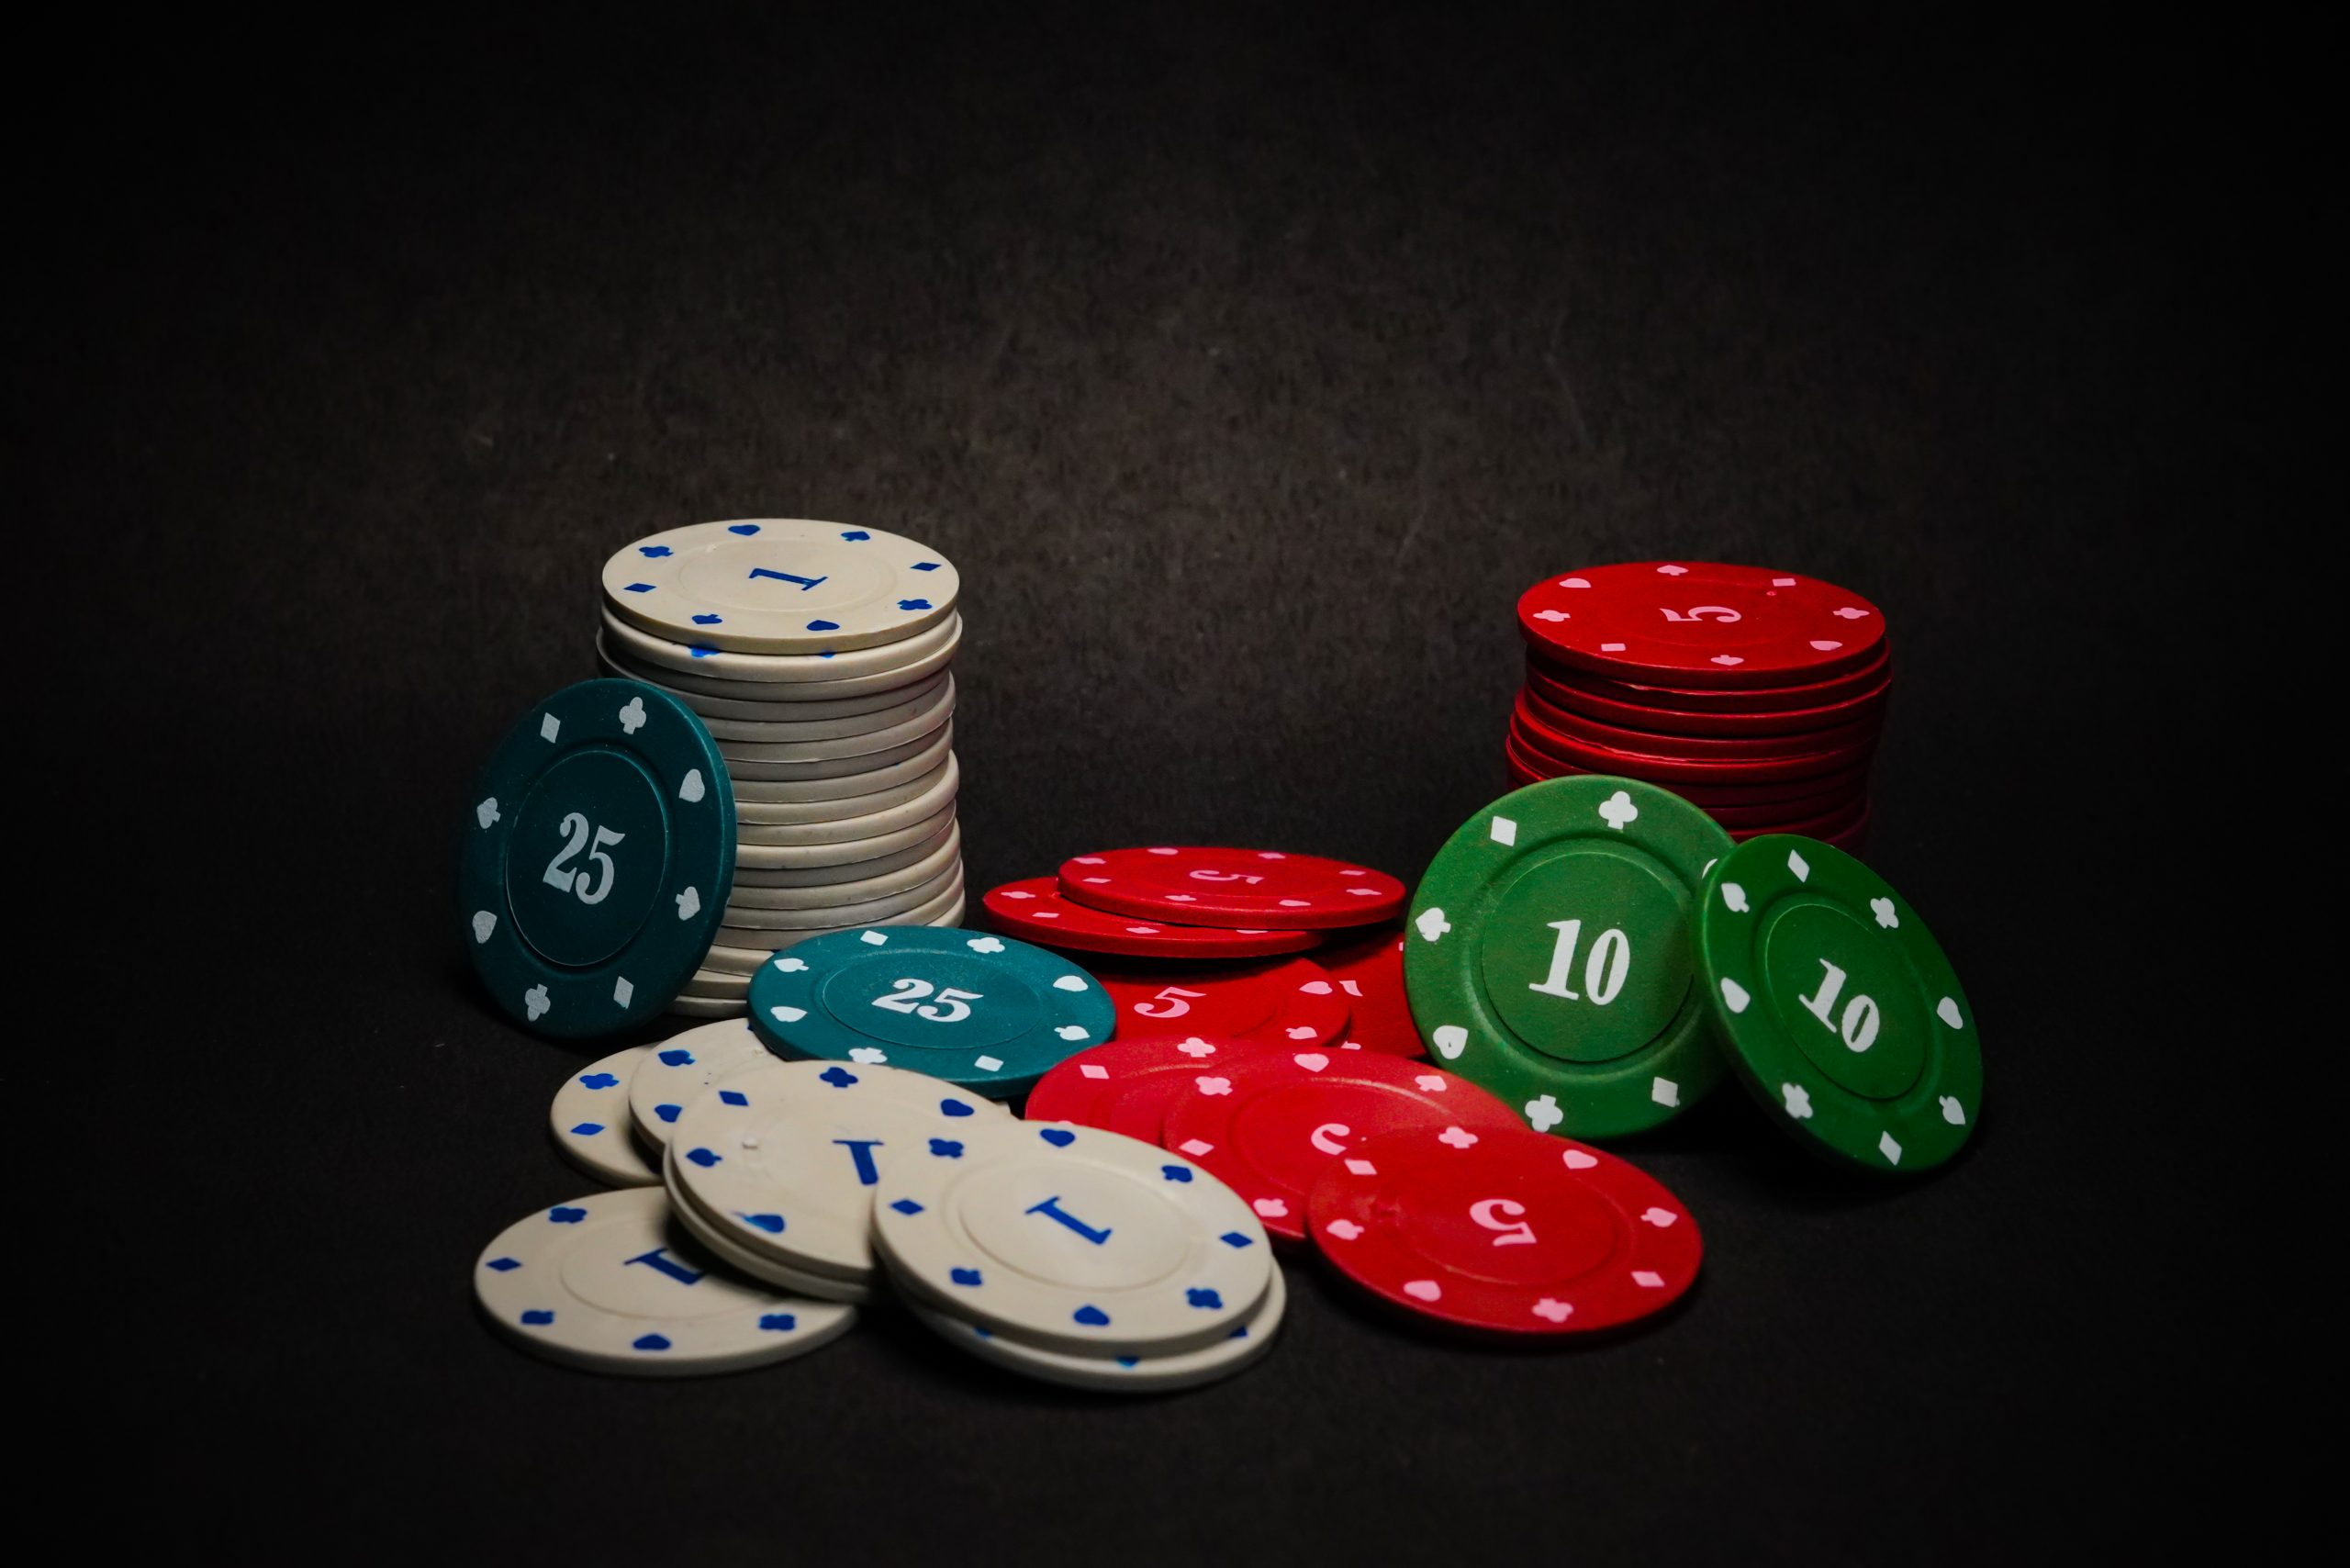 Deck of Poker Chips